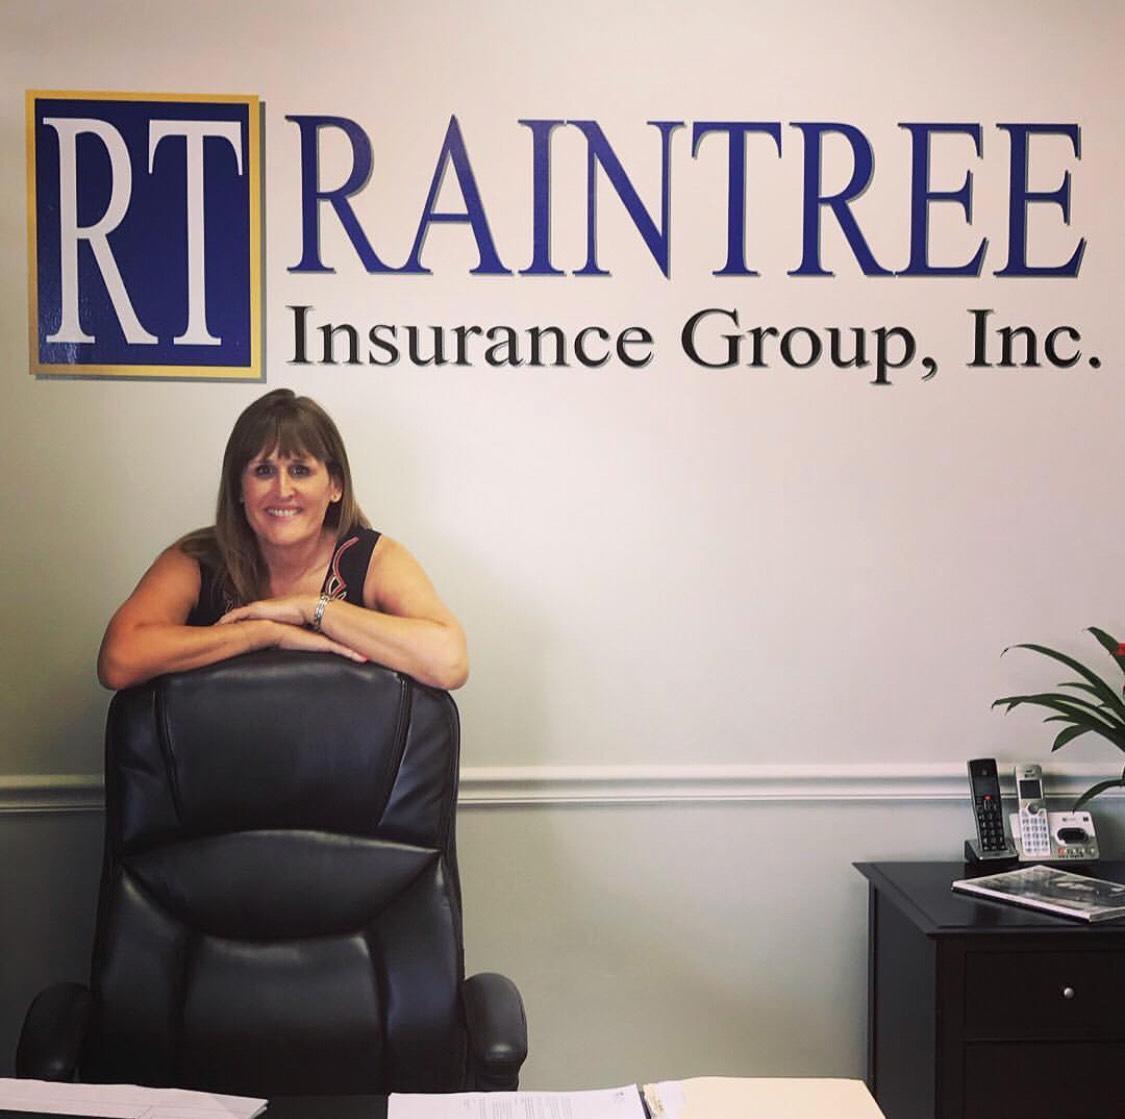 Raintree Insurance Group image 3